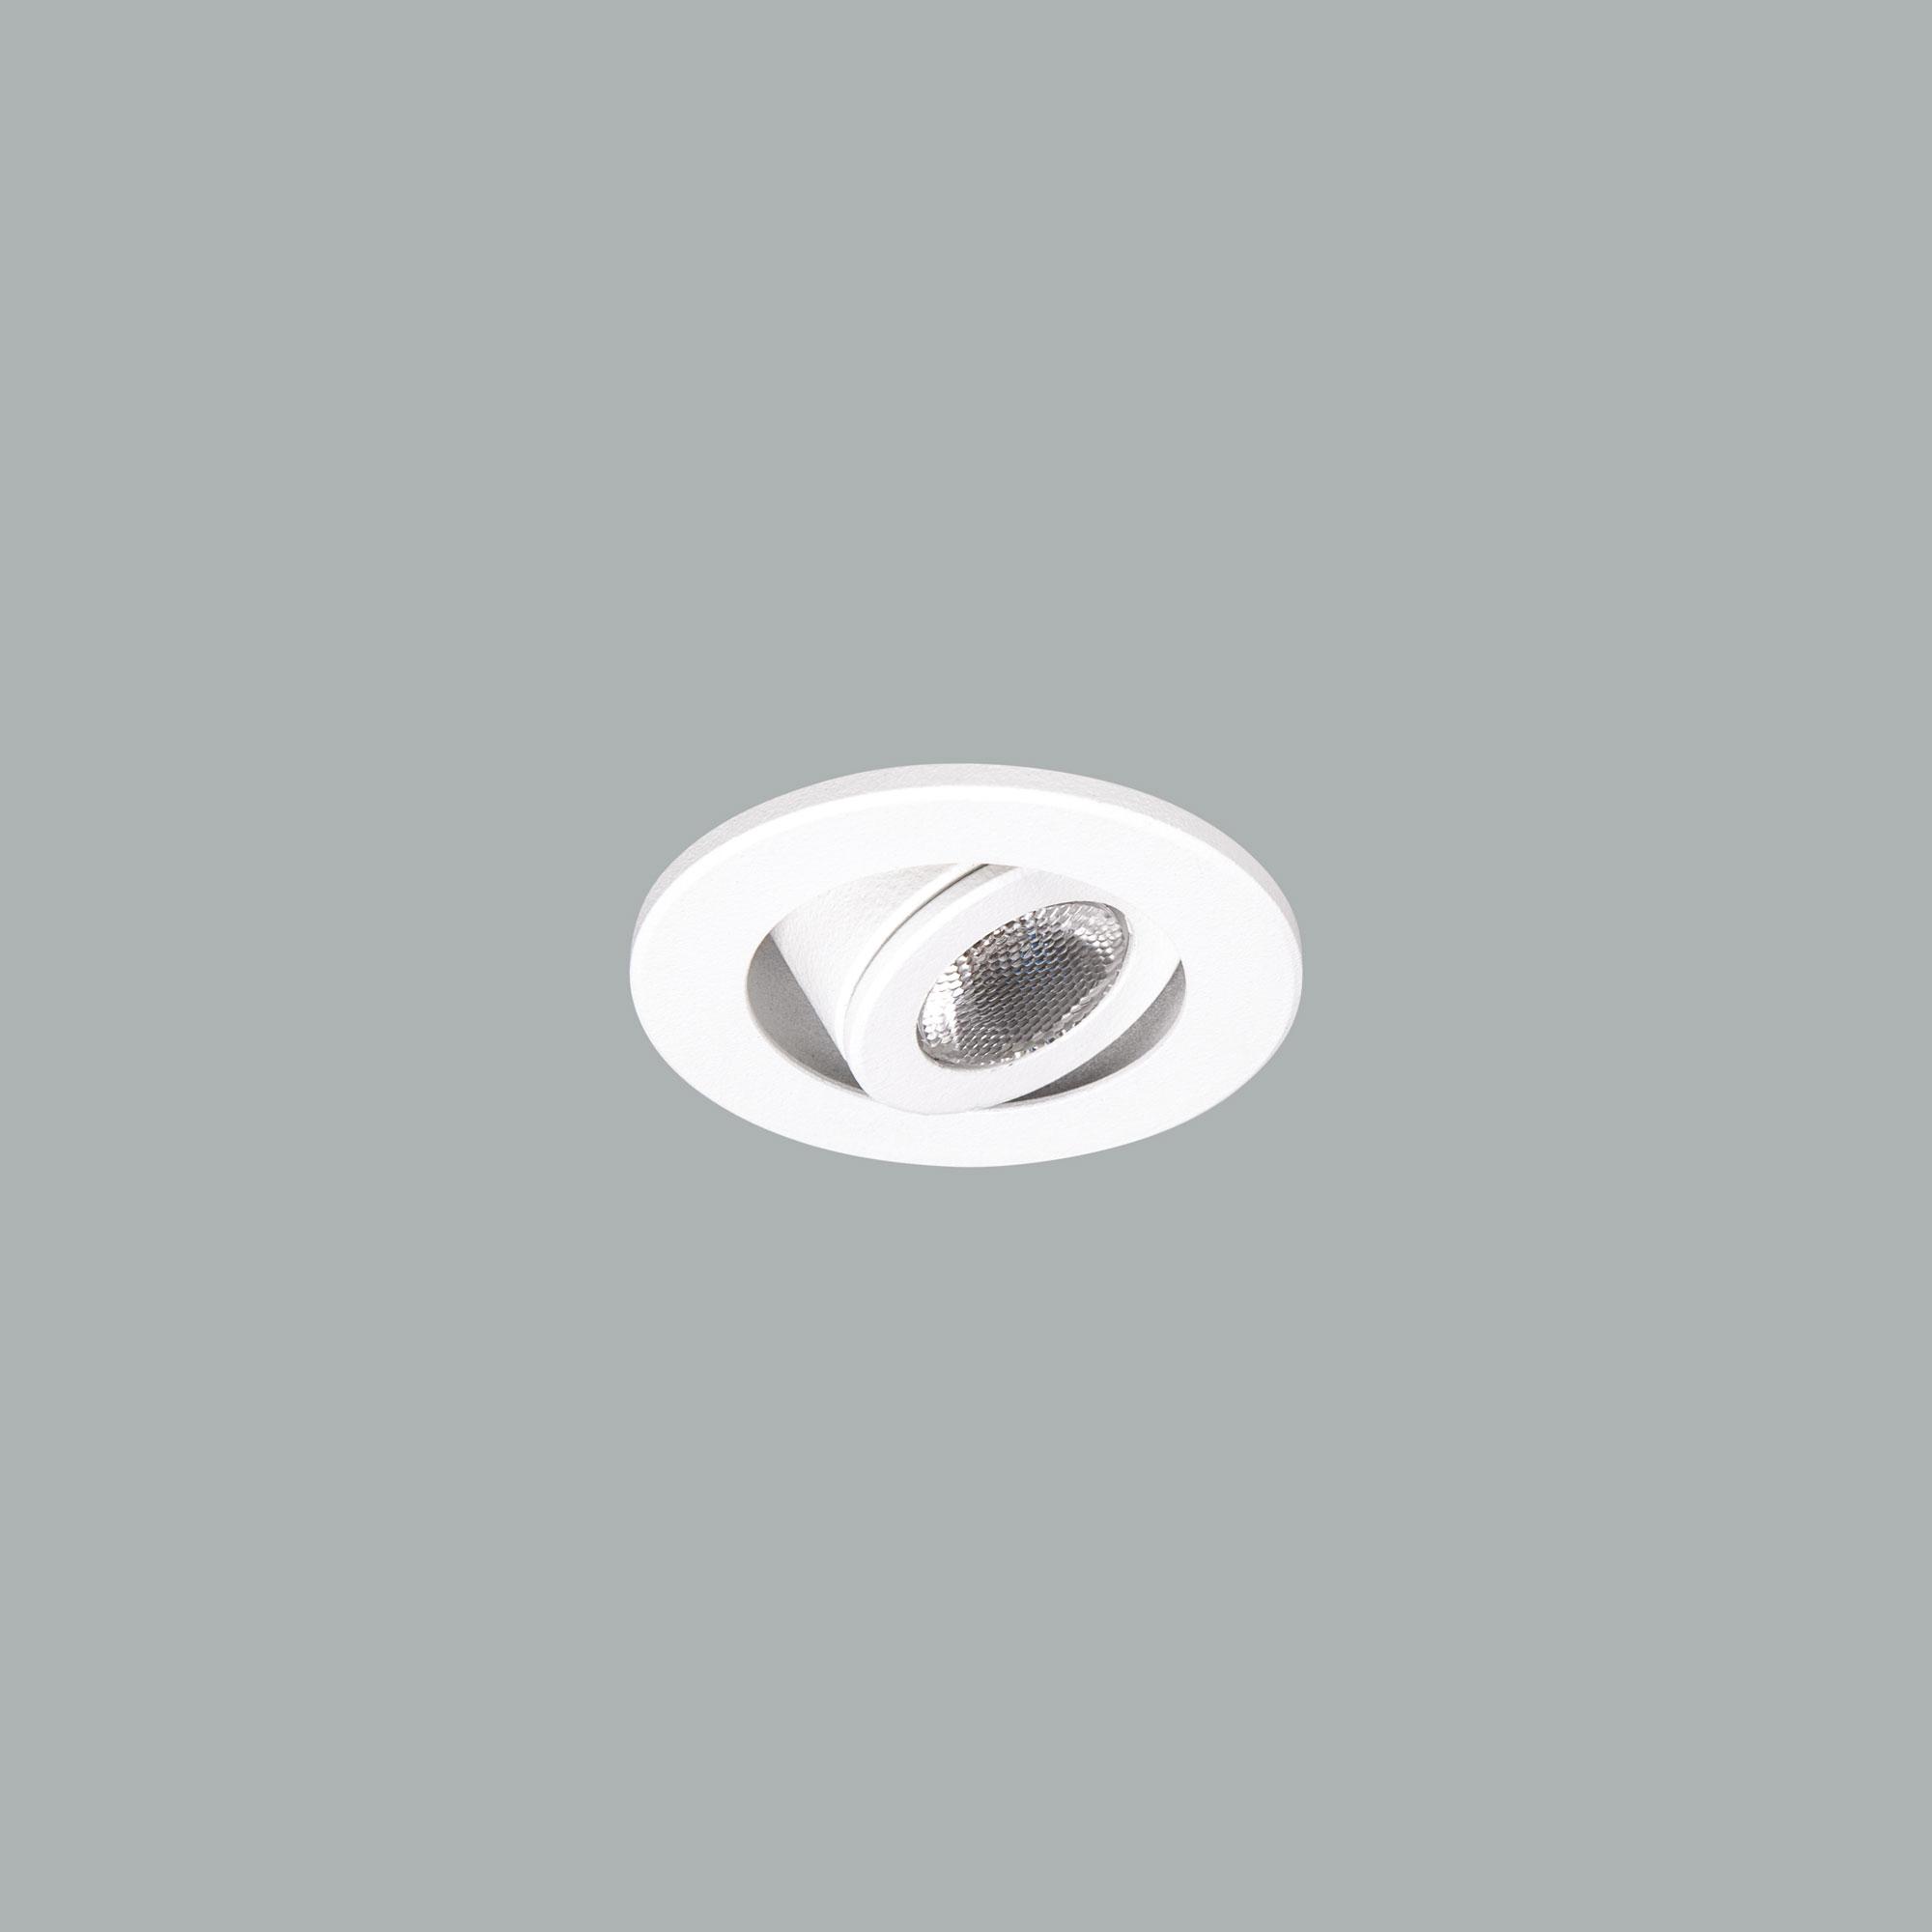 I02.PLR.L0106_1